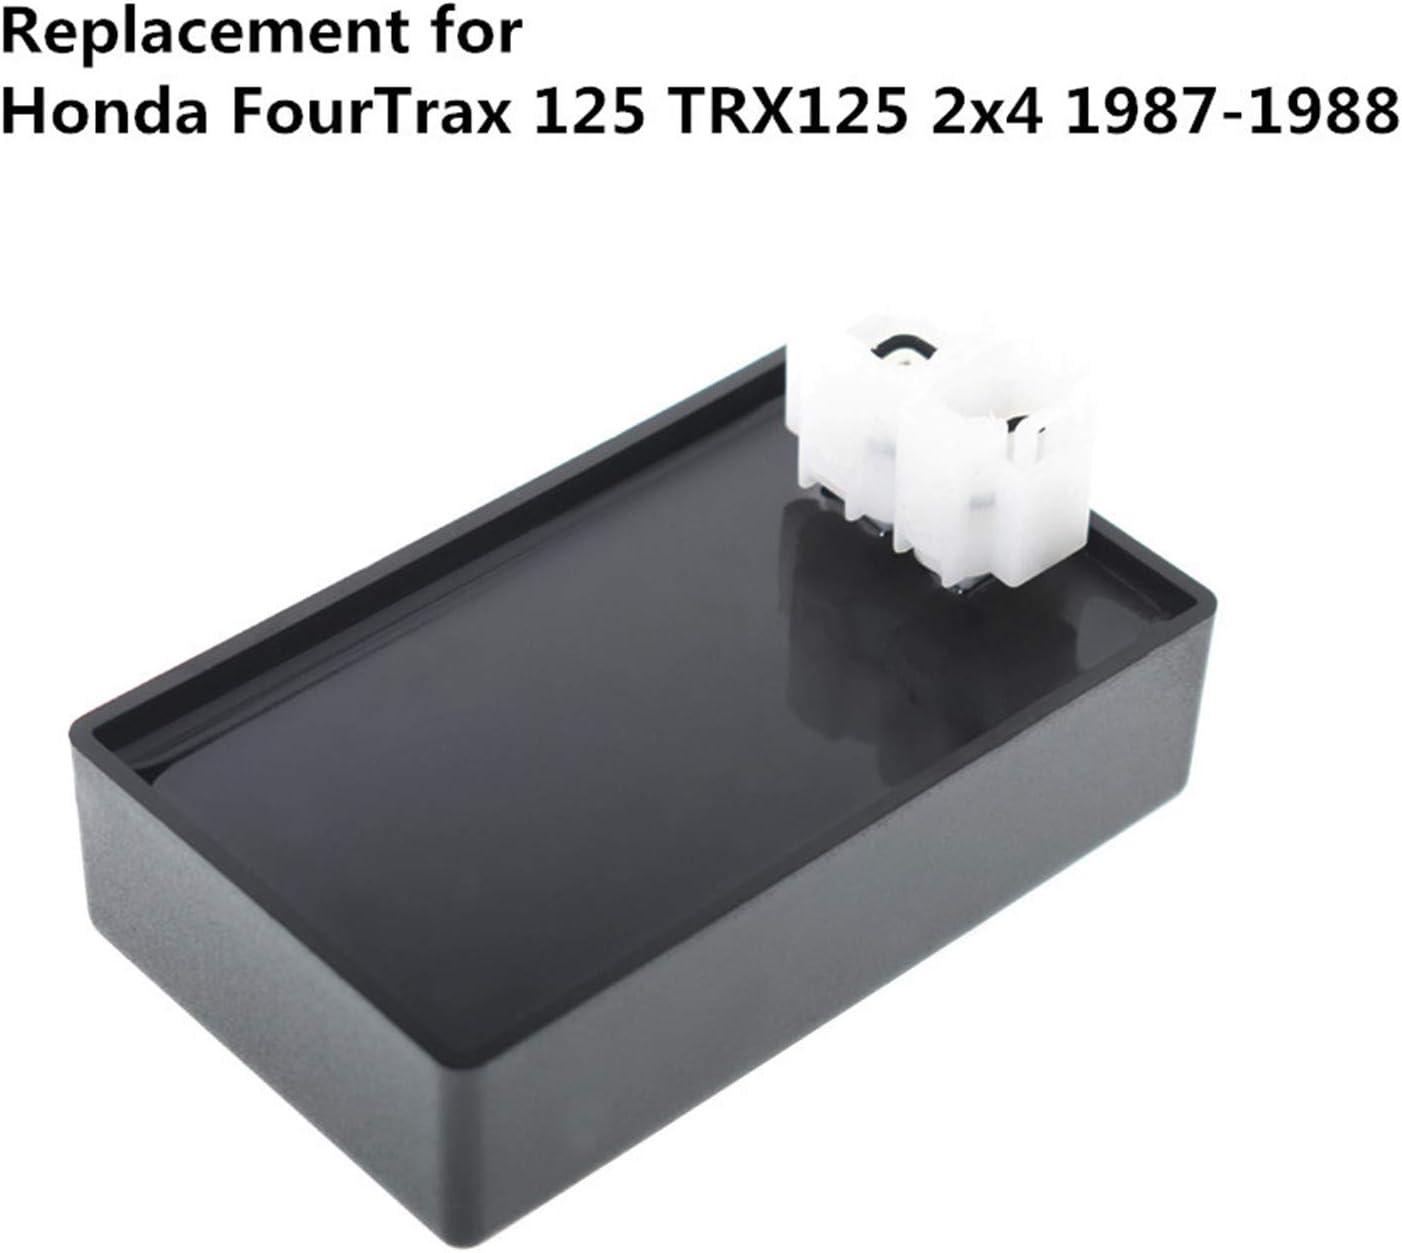 labwork CDI Box Replacement for Honda FourTrax 125 TRX125 2x4 1987-1988